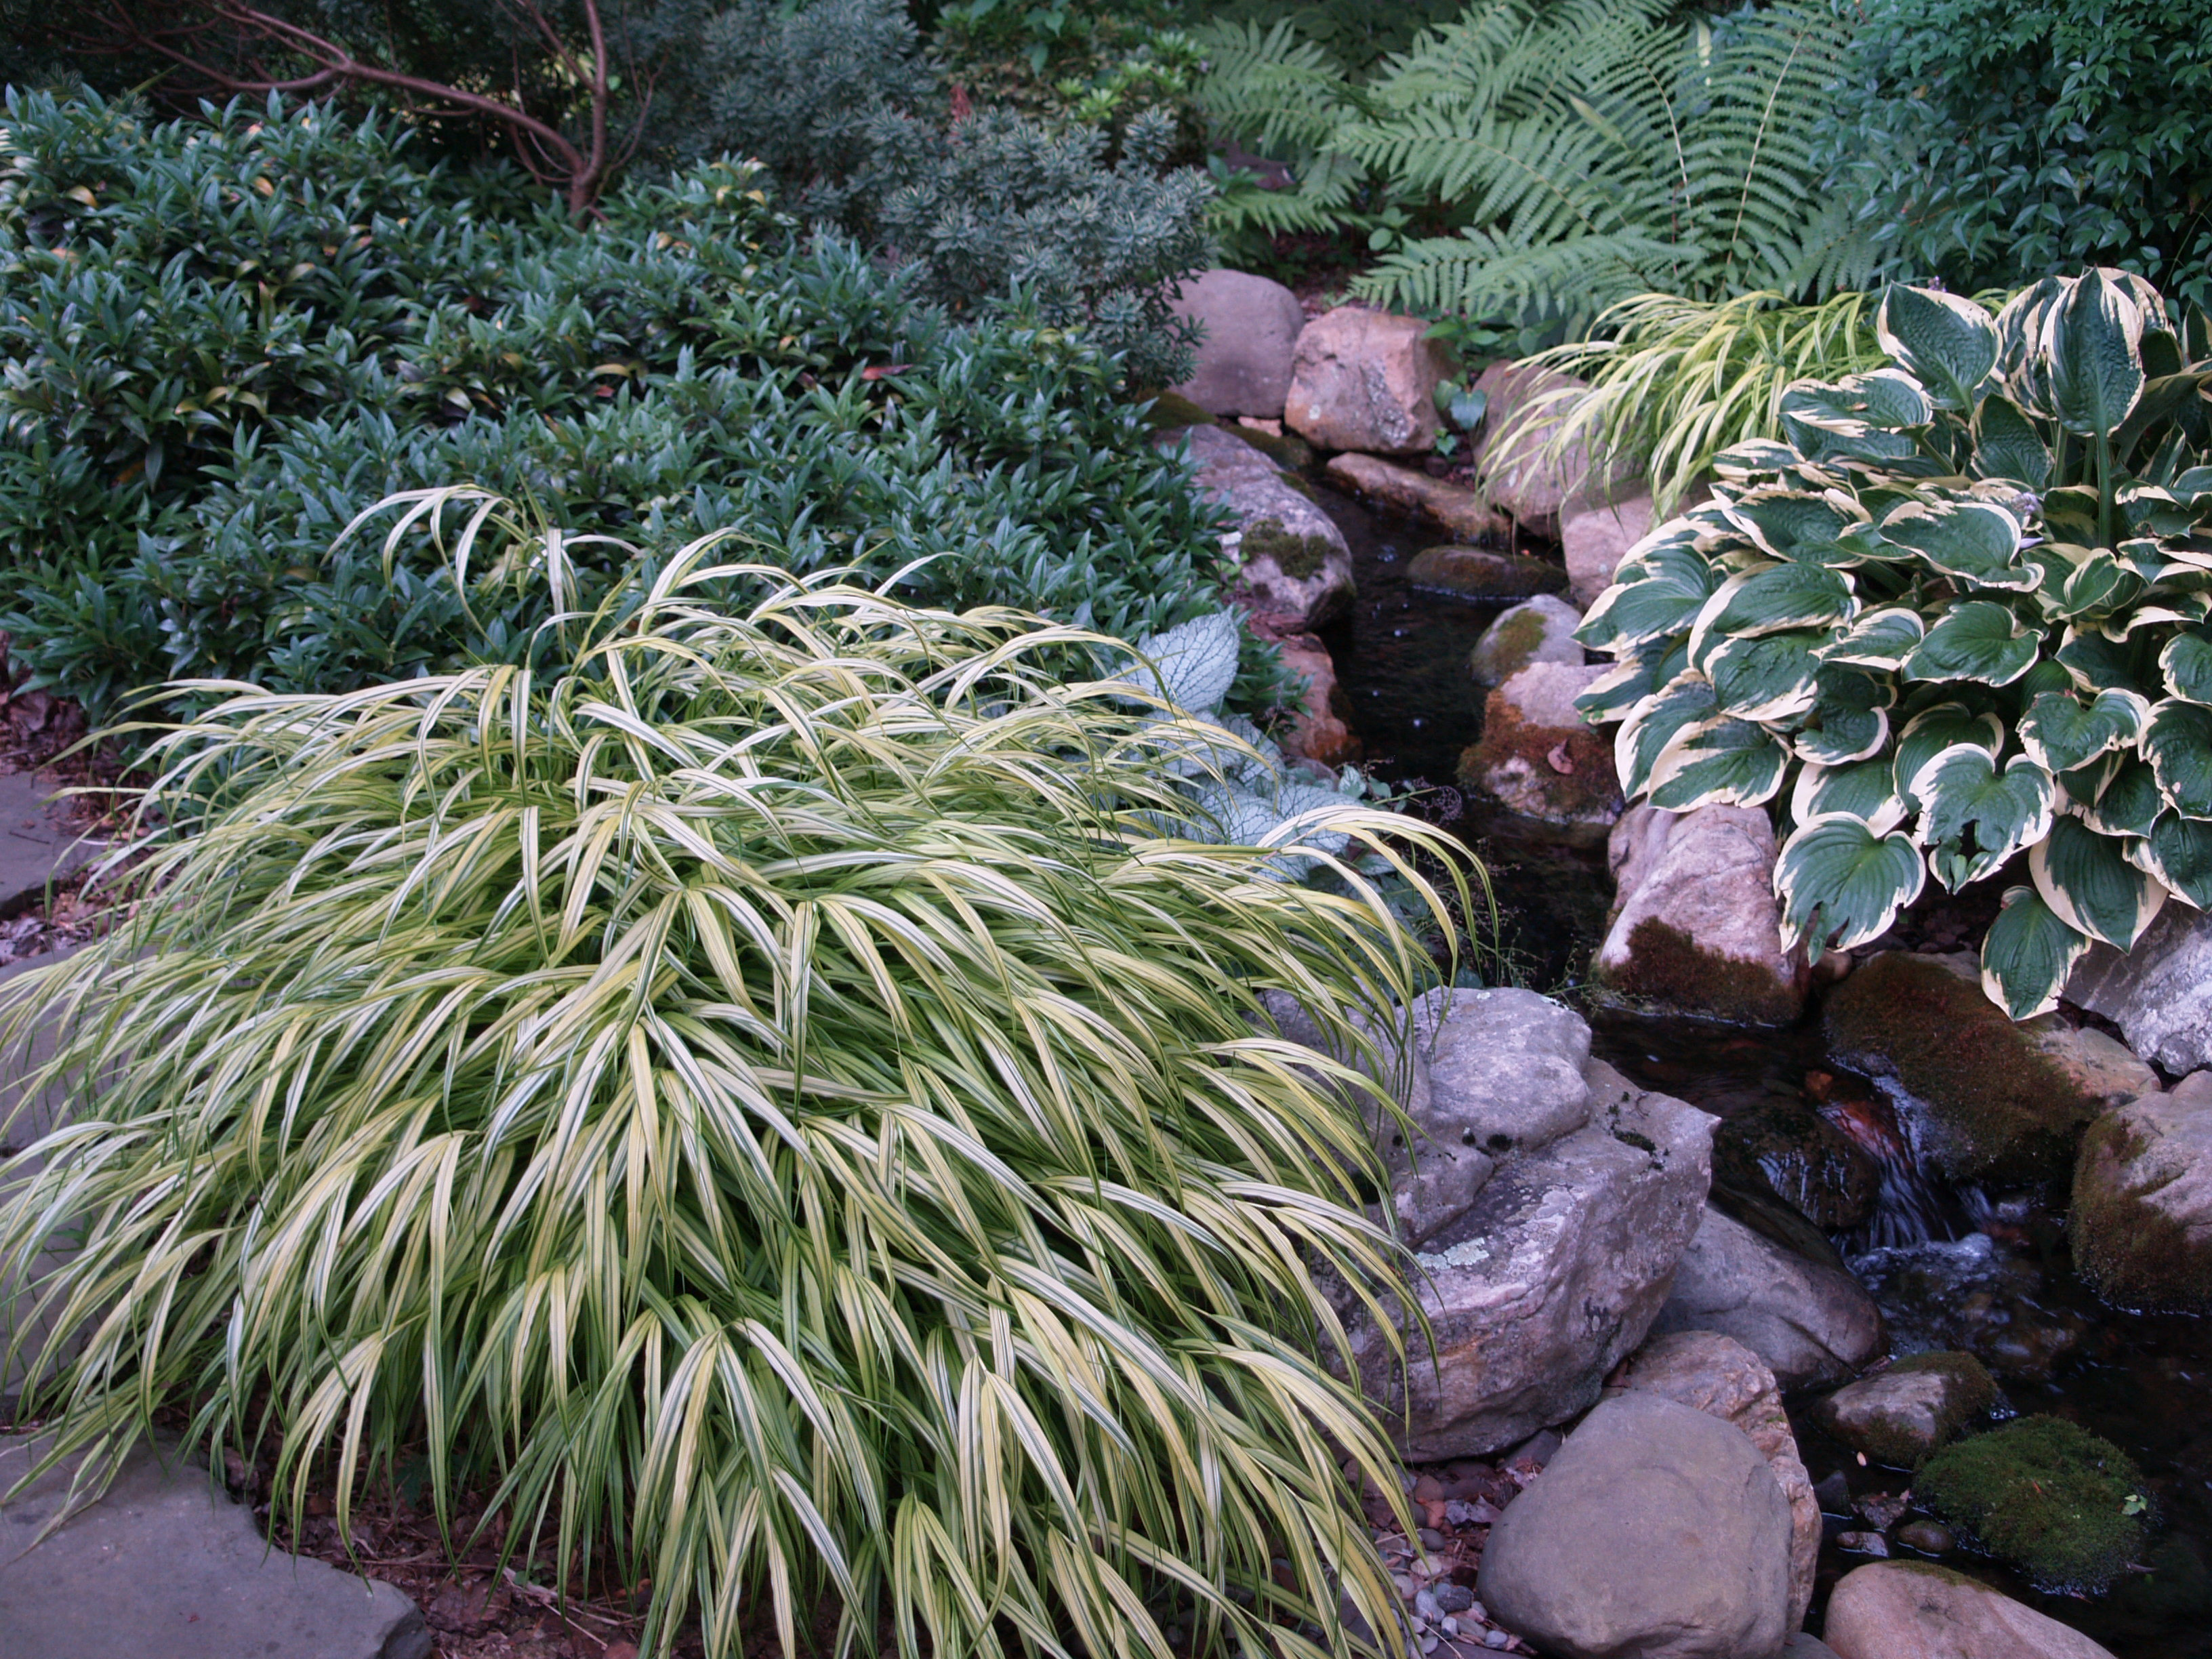 Japanese water garden plants - If